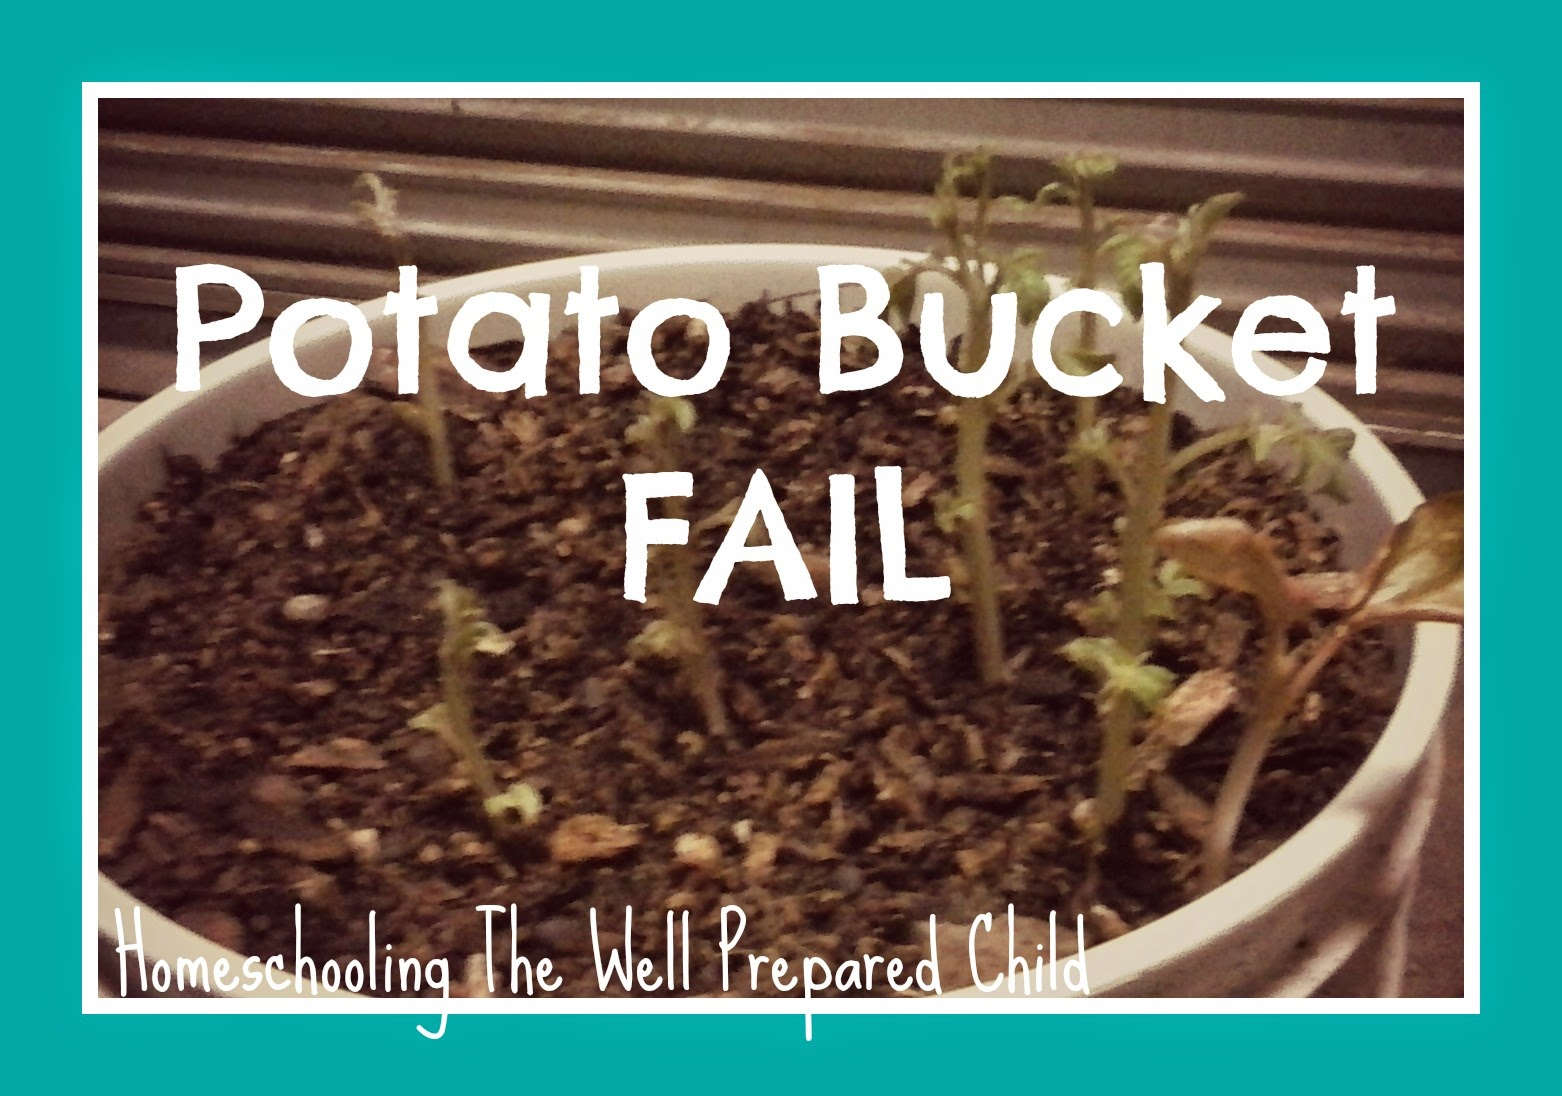 Homeschooling The Well Prepared Child: Potato Bucket FAIL